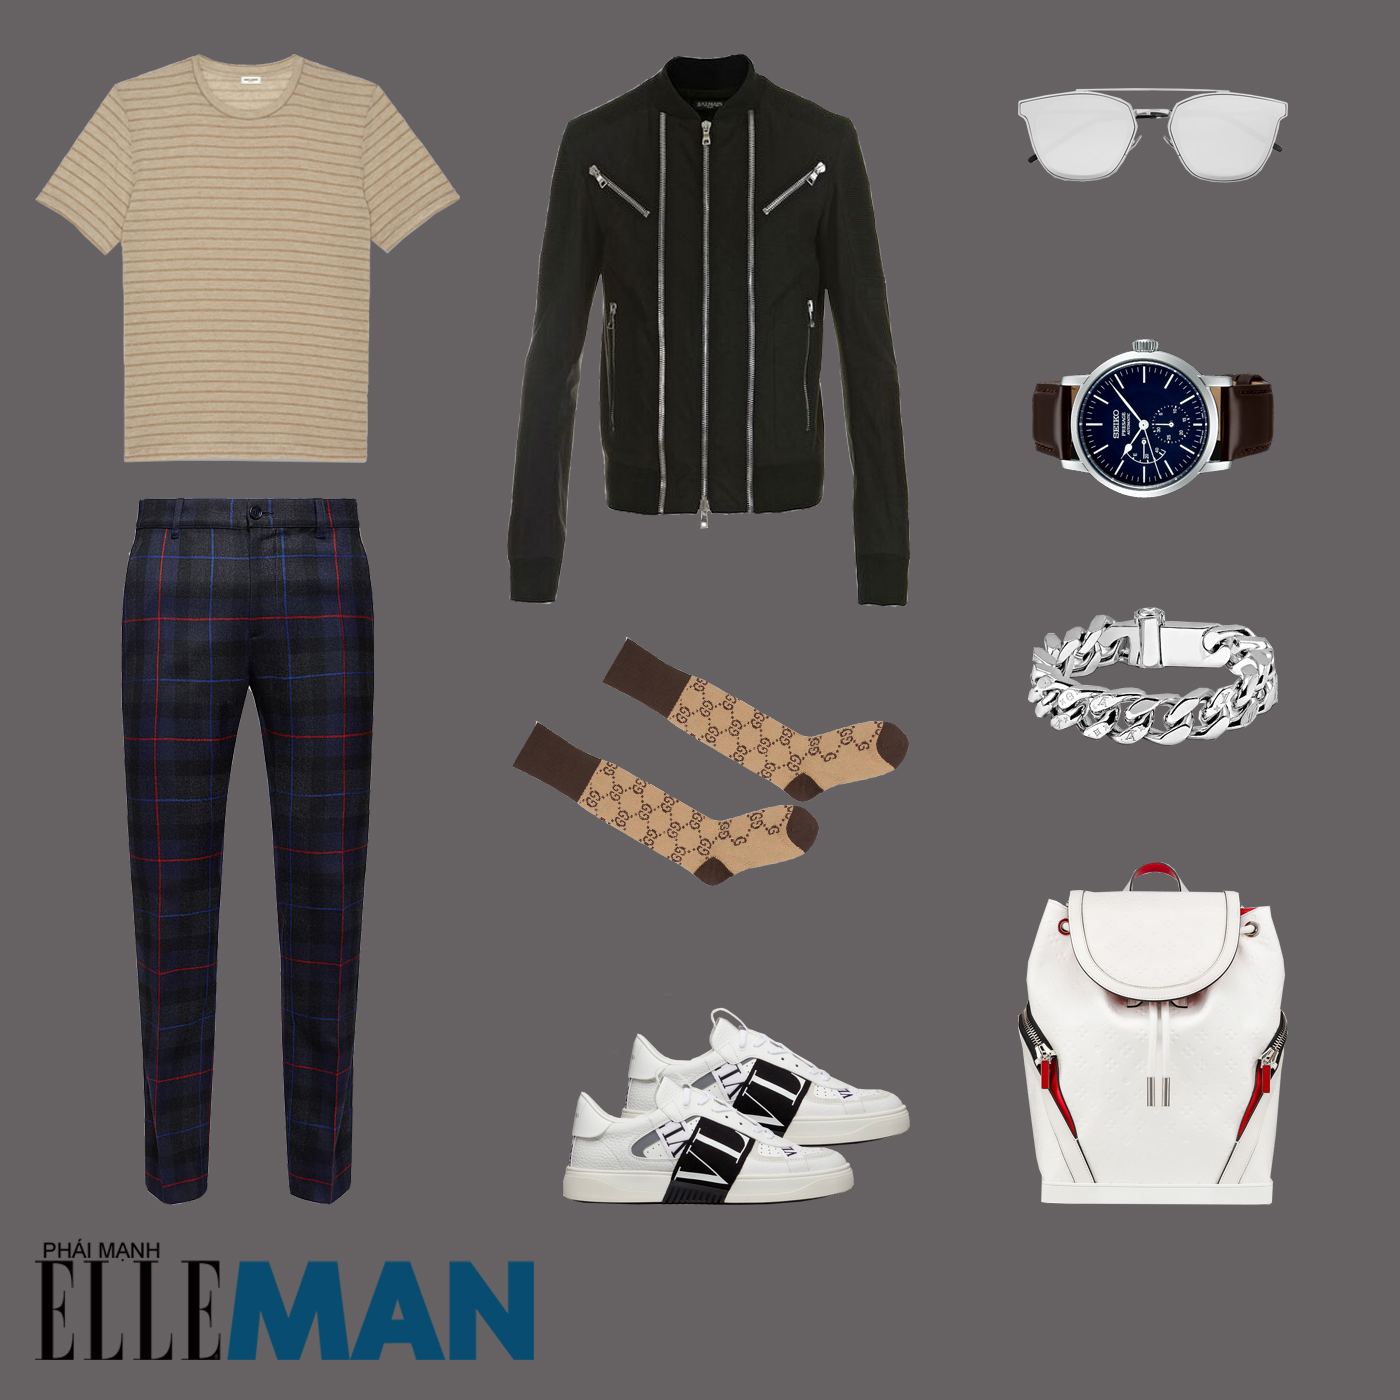 outfit 1 - phối đồ phong cách smart-casual